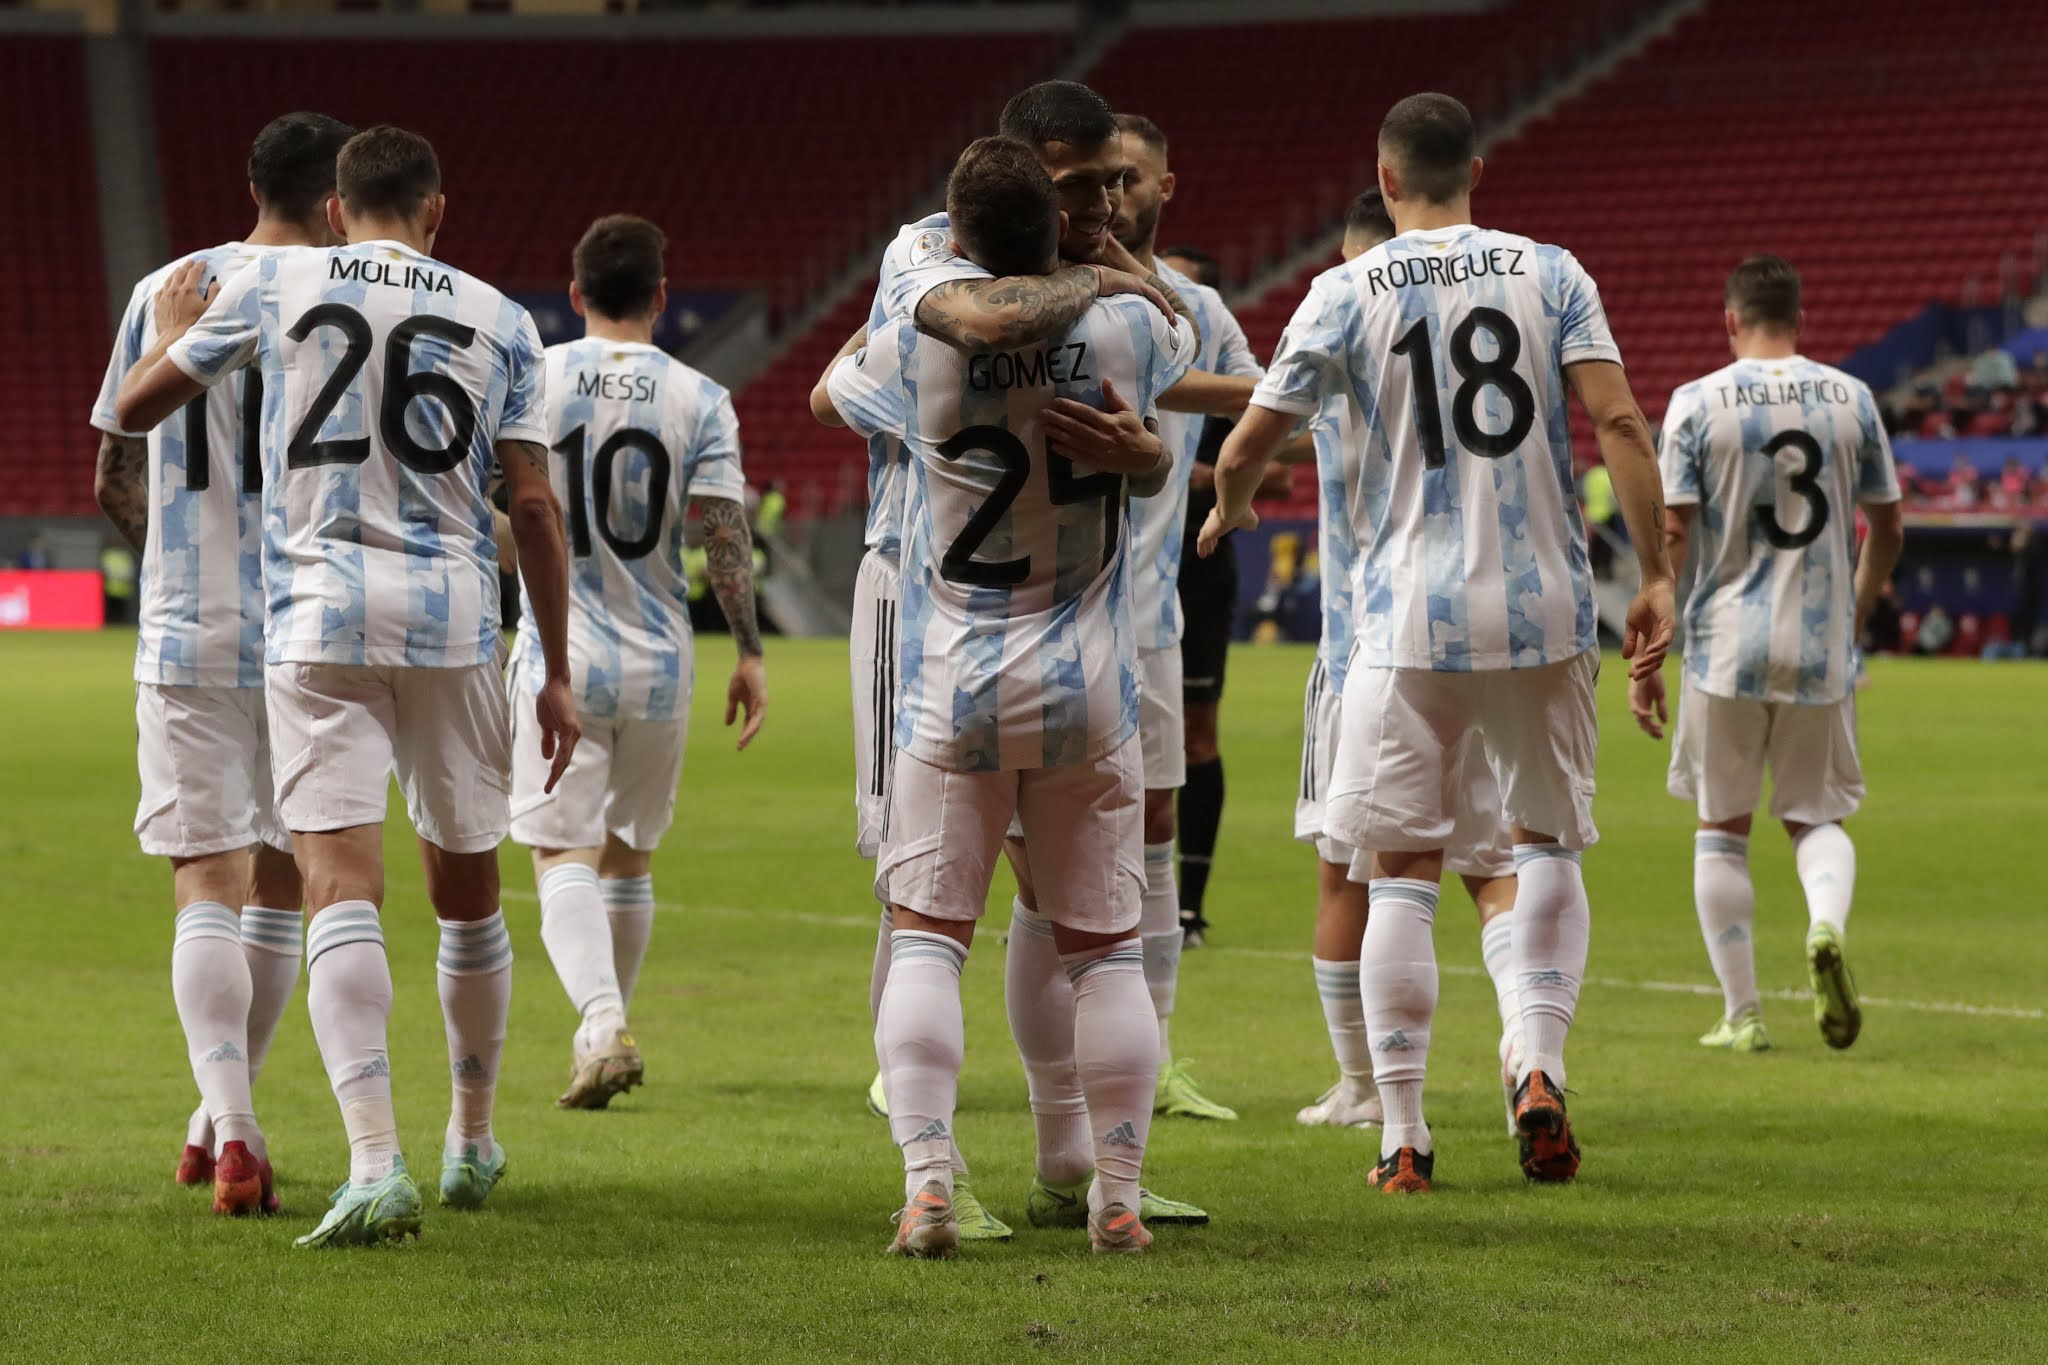 Argentina se clasificó a octavos de la Copa América luego de vencer a Paraguay